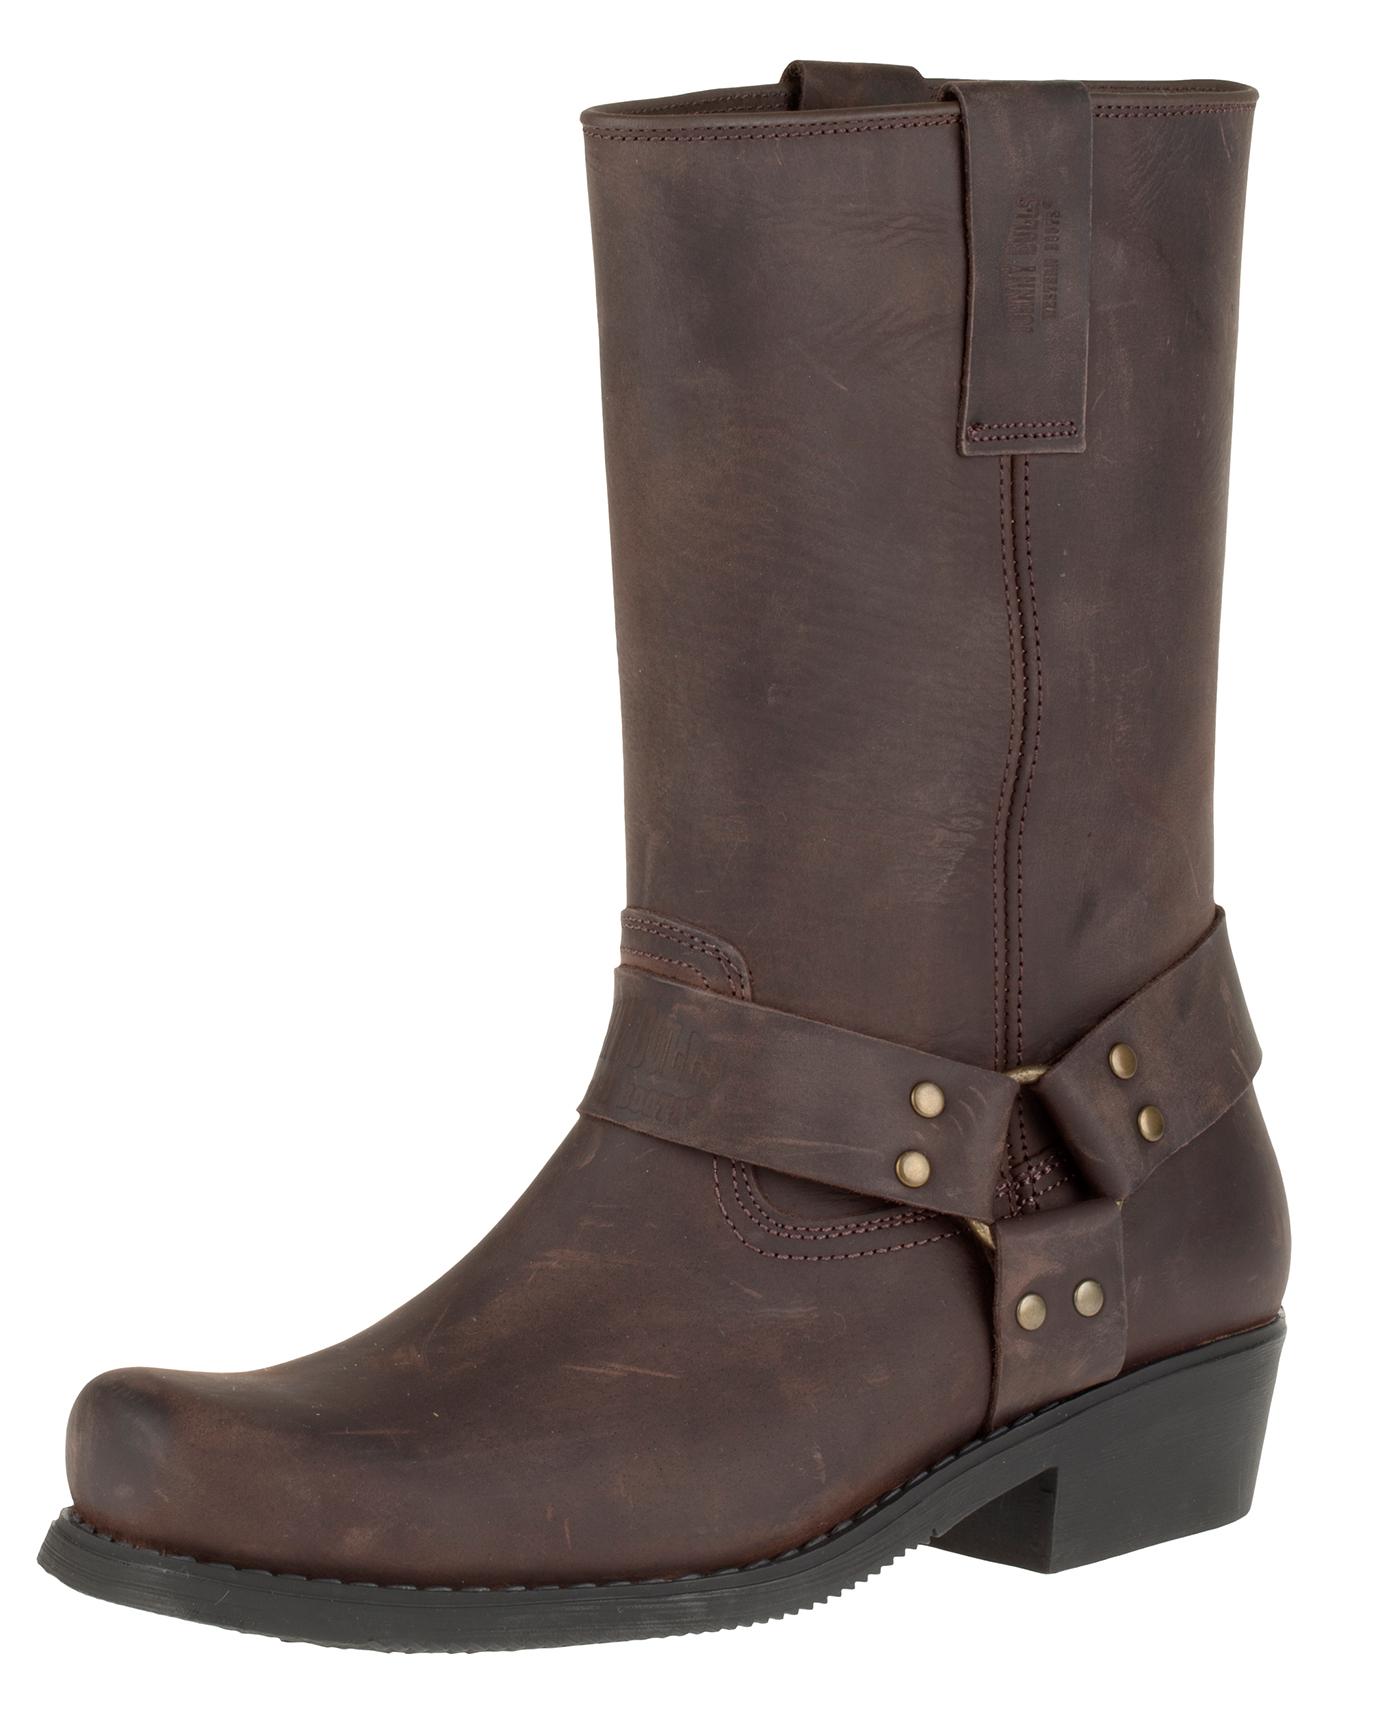 896d6cf4f9b Westernové boty JOHNNY BULLS - K 081